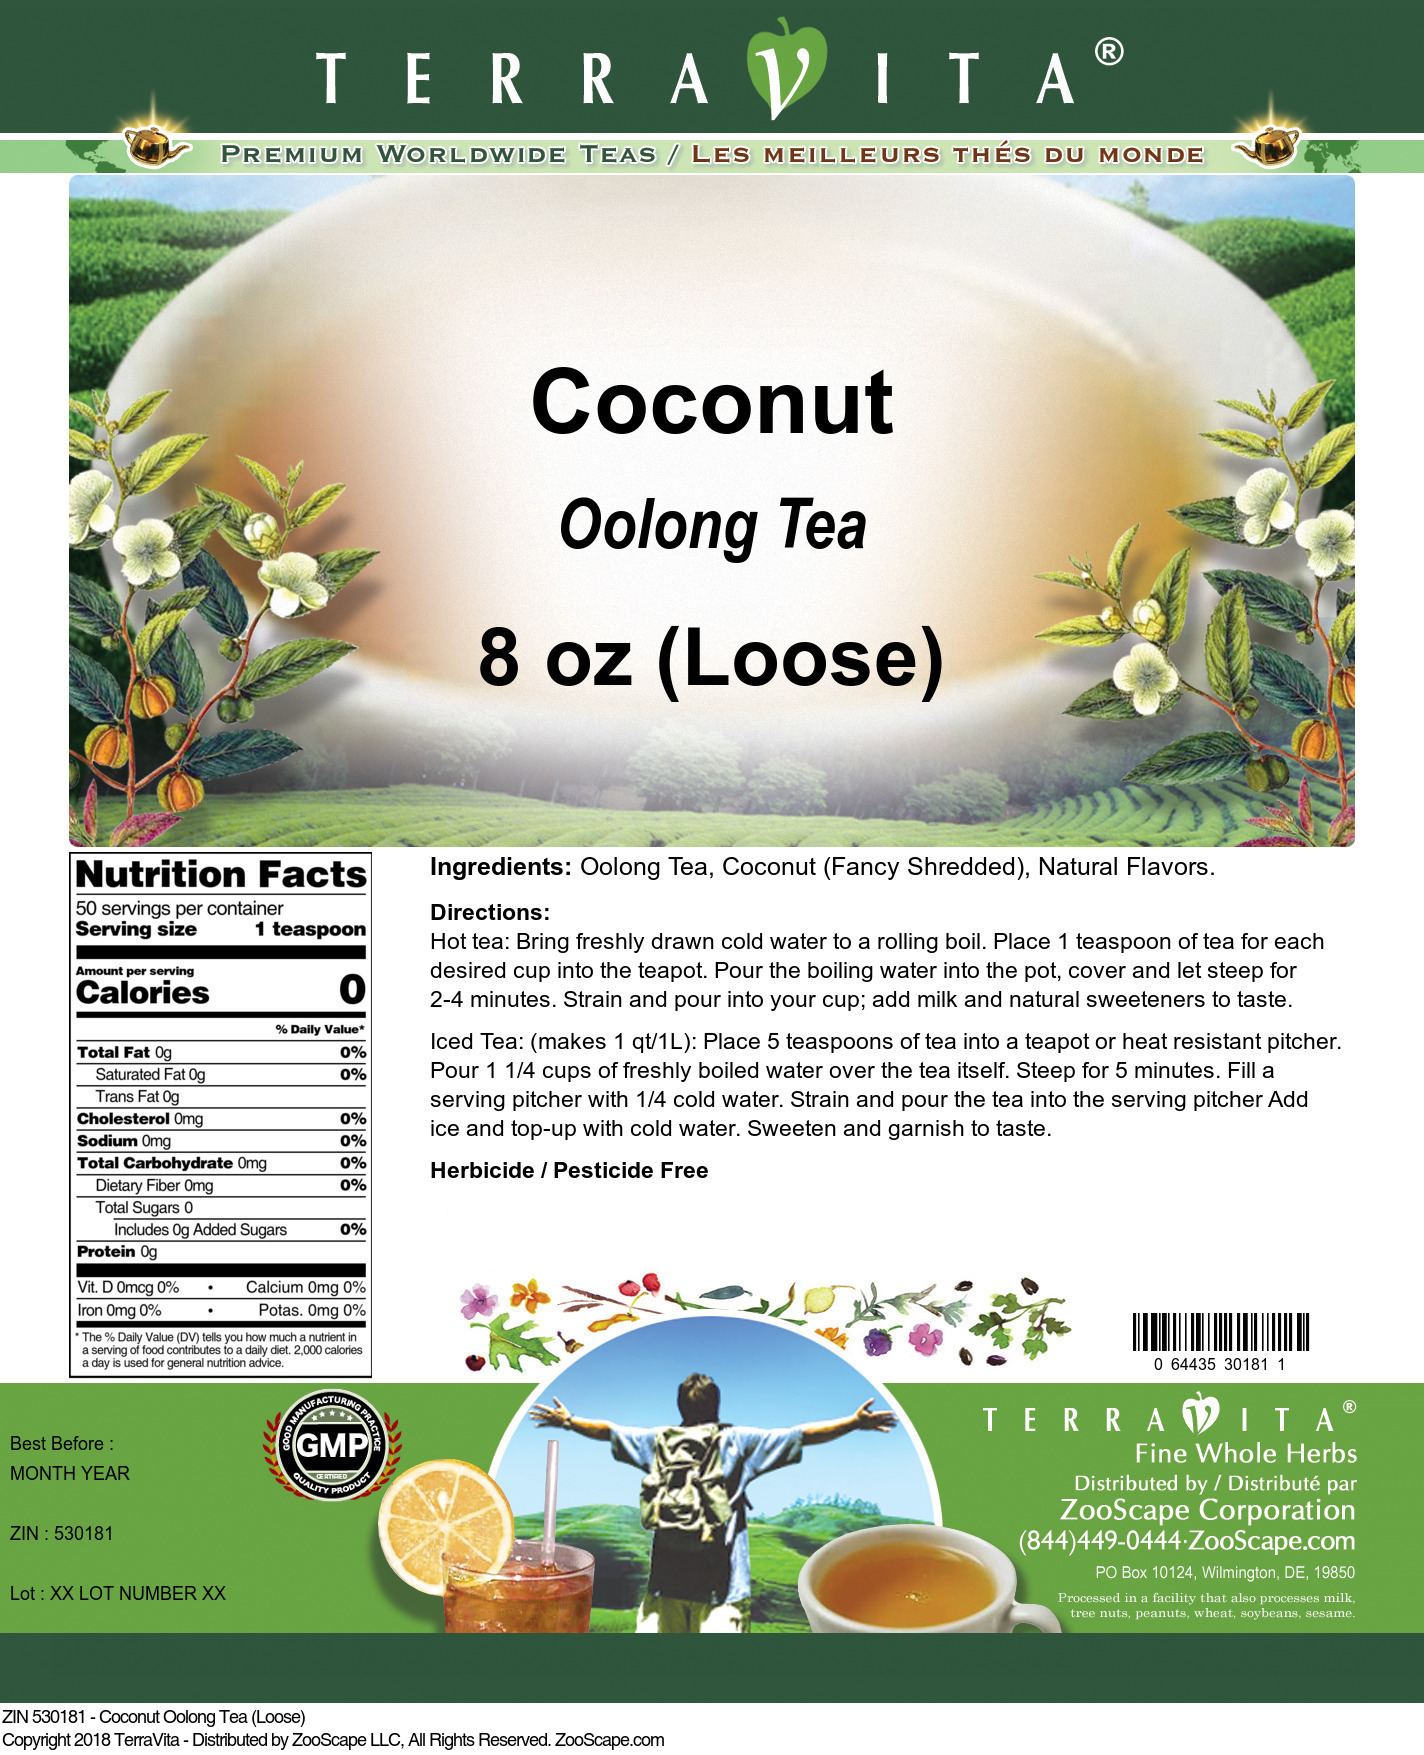 Coconut Oolong Tea